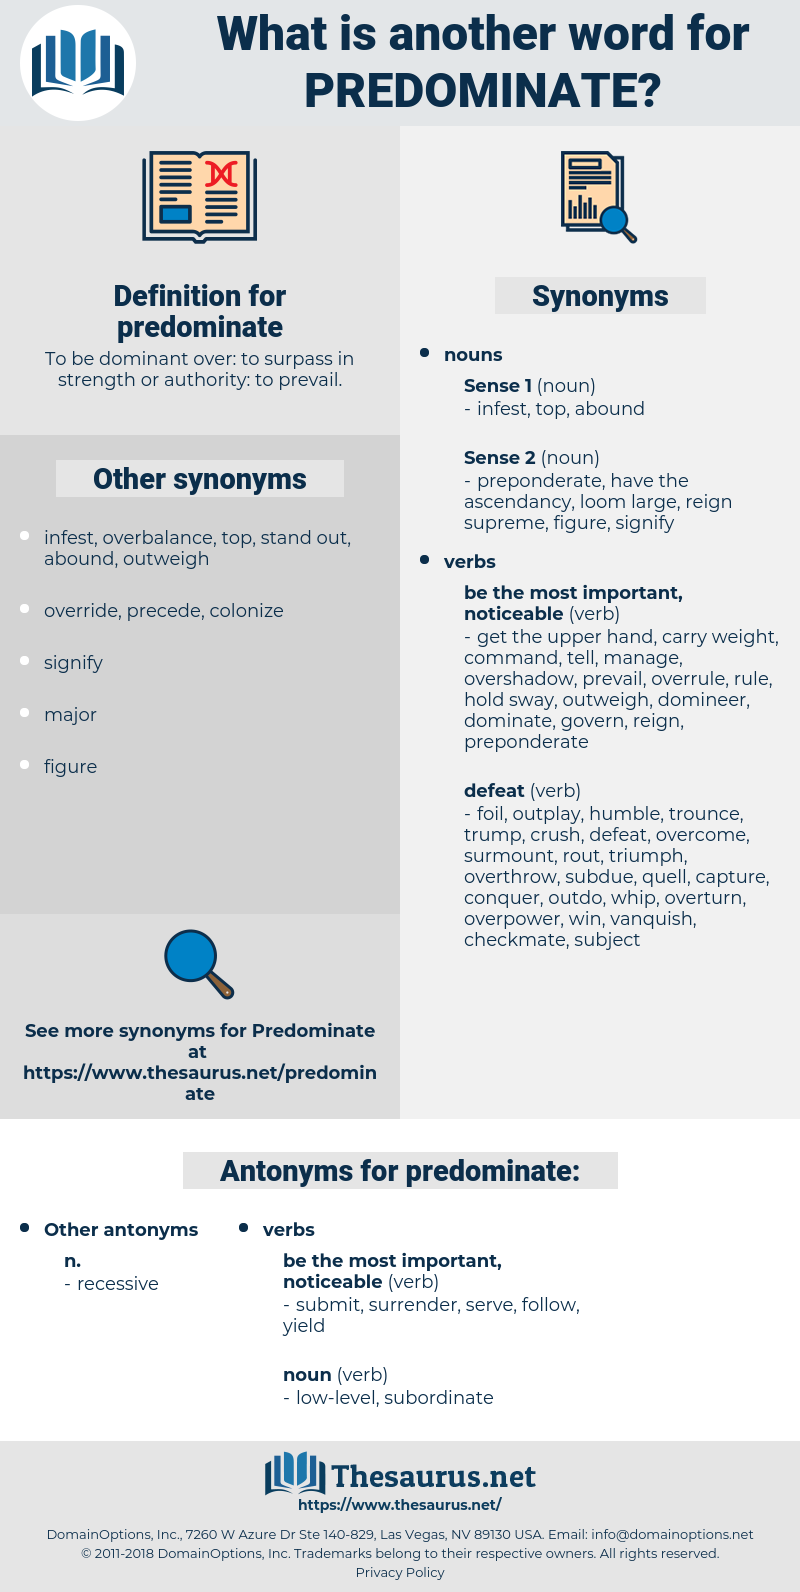 predominate, synonym predominate, another word for predominate, words like predominate, thesaurus predominate